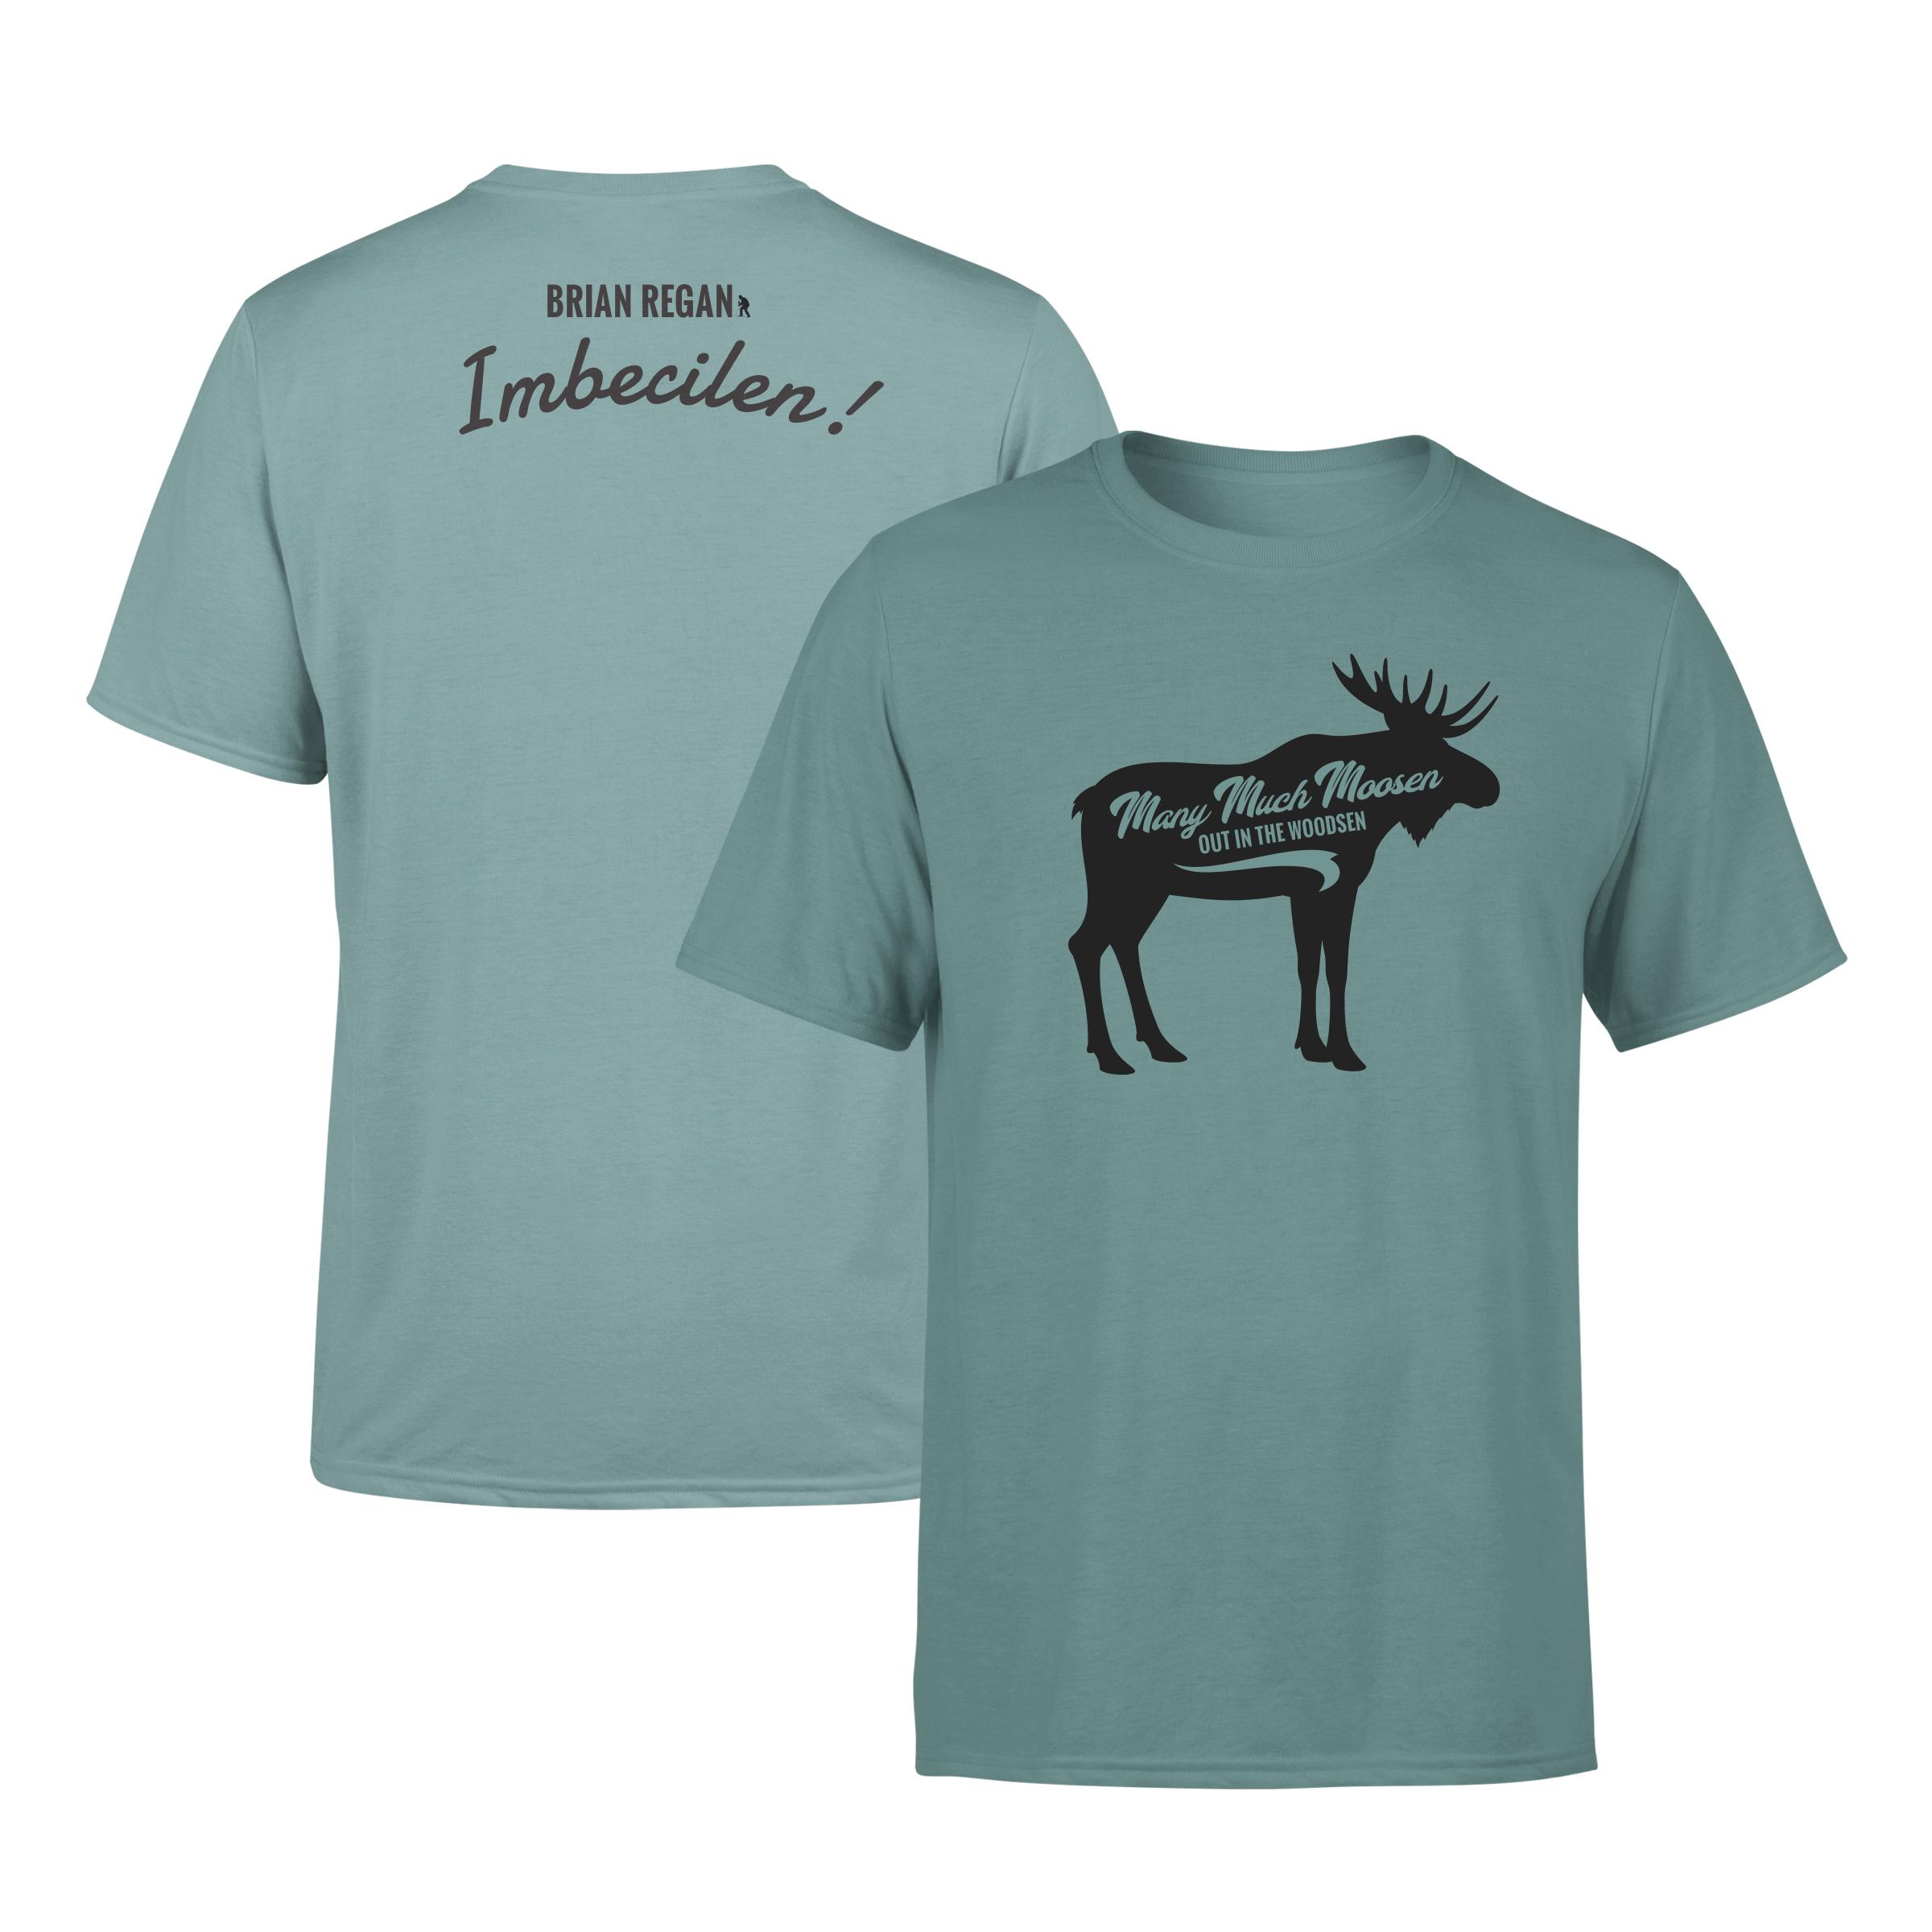 Many Much Moosen T-shirt